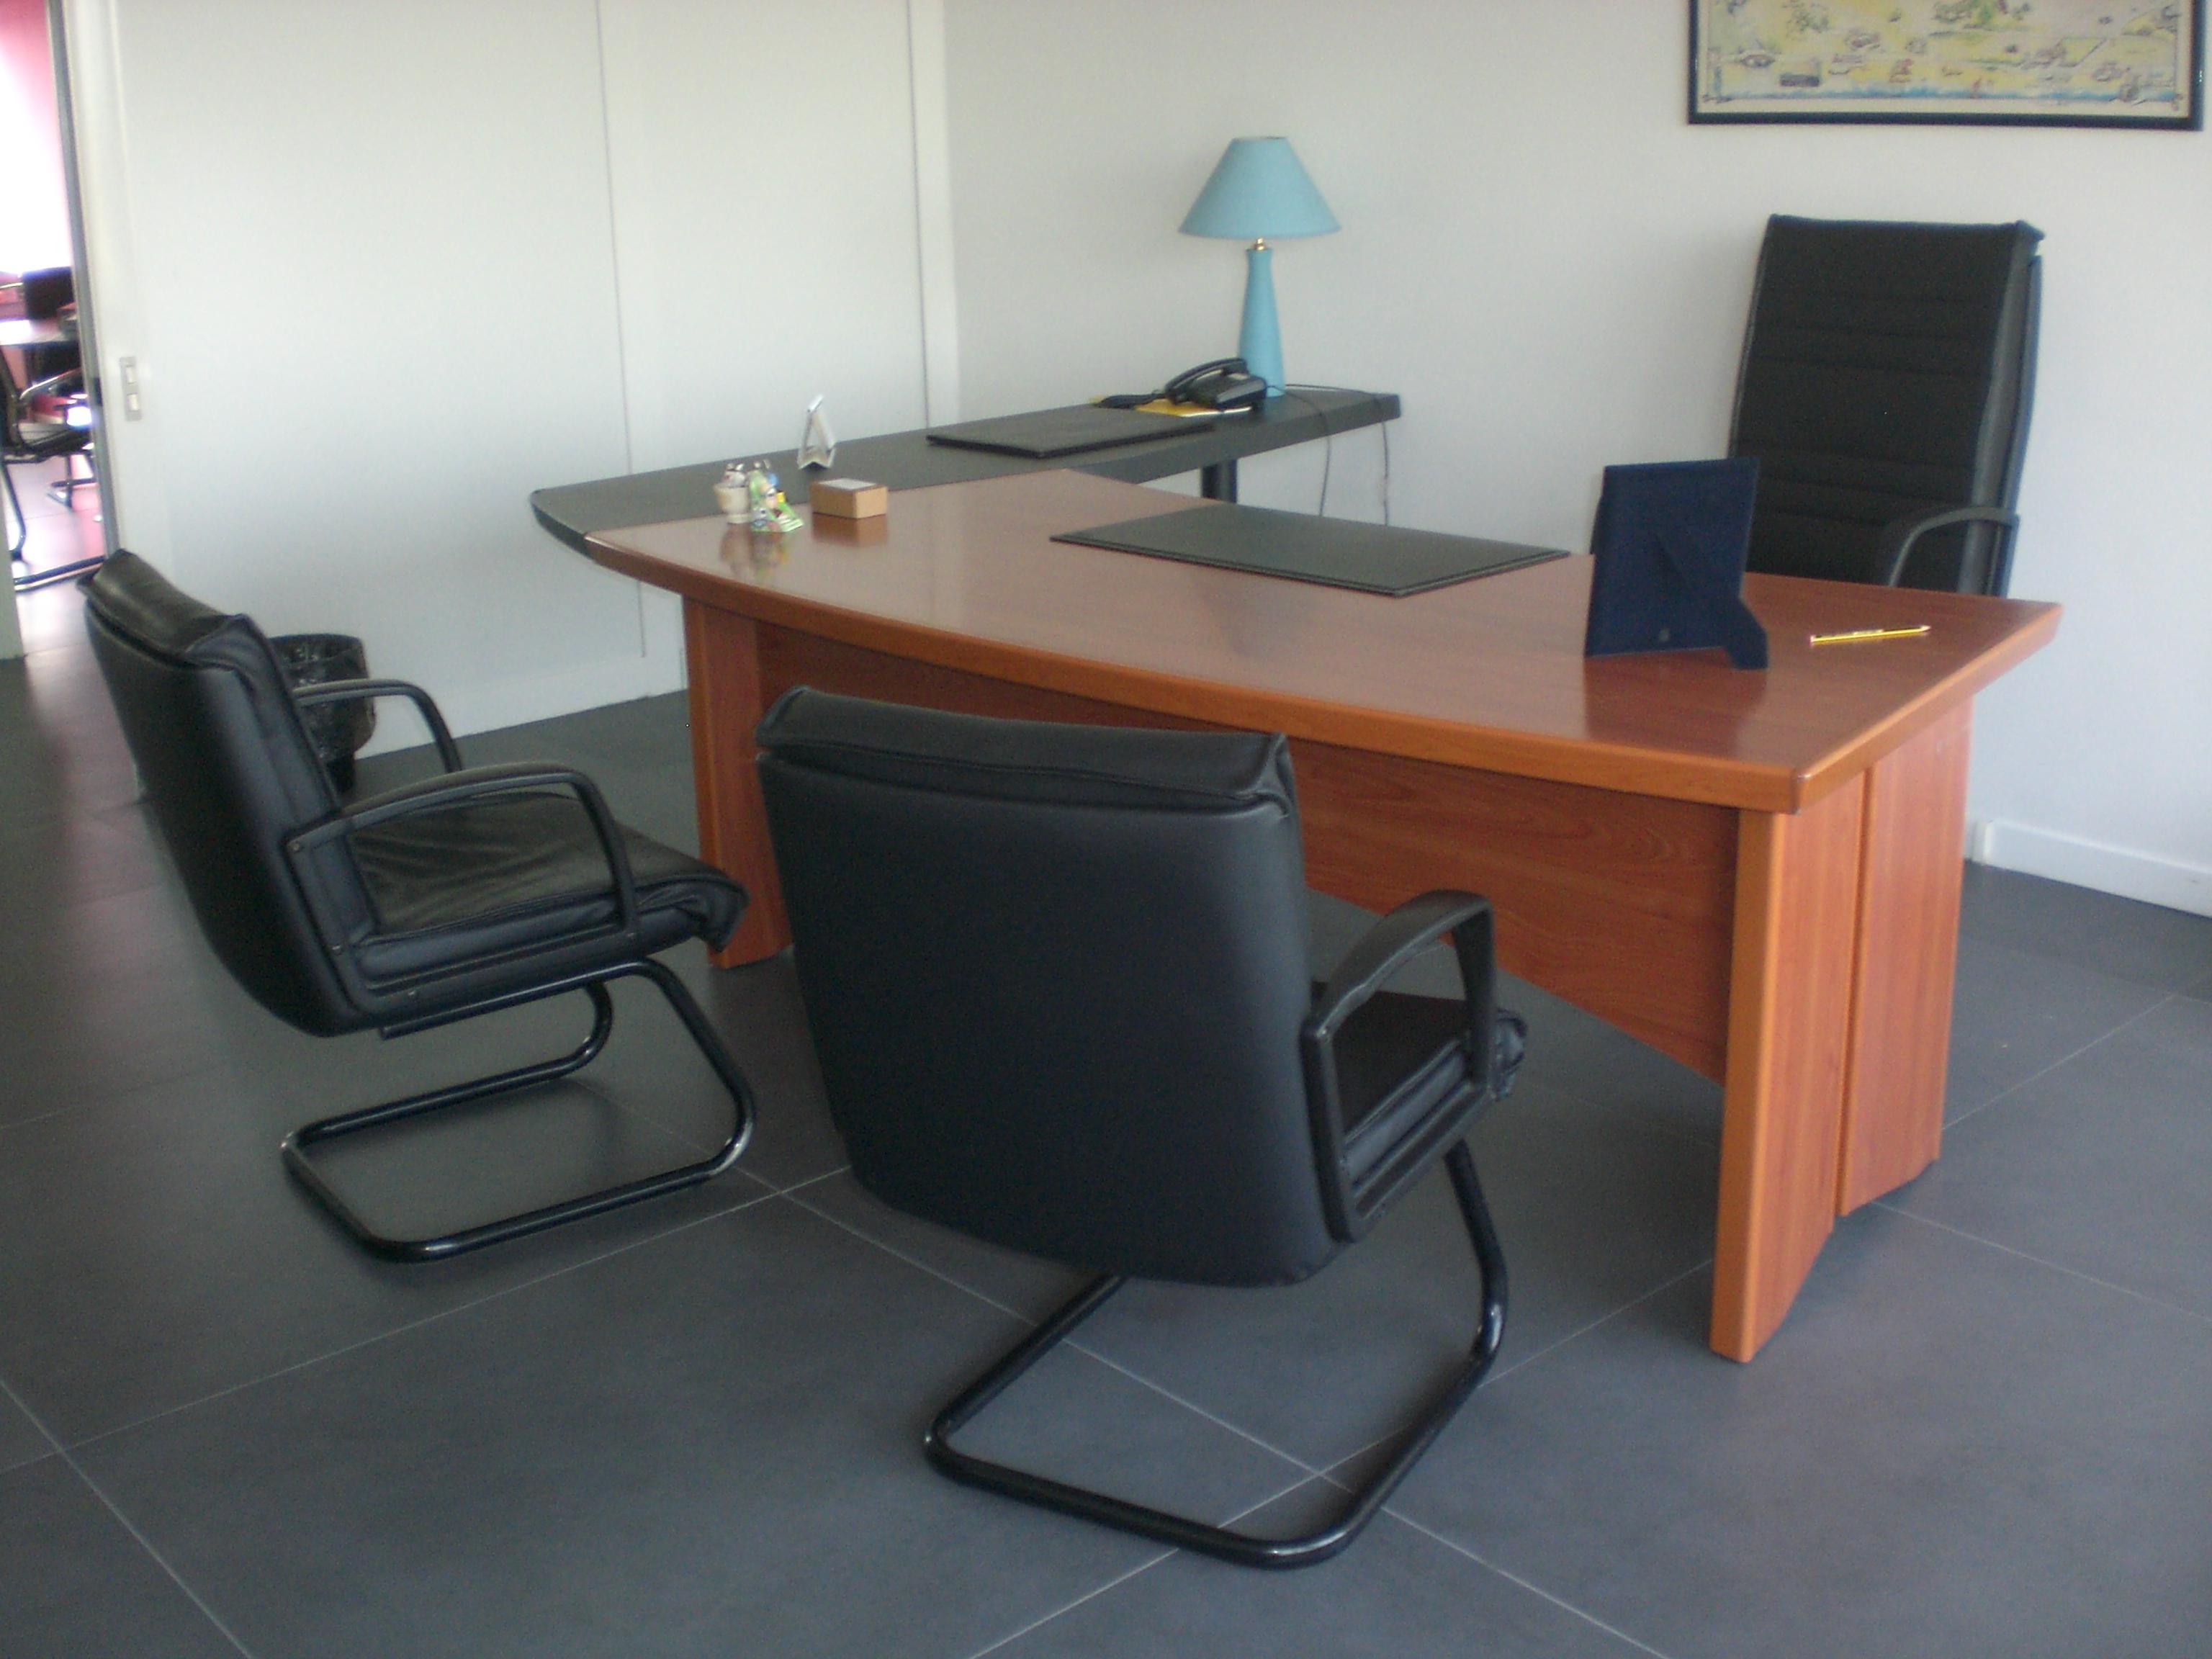 Affitto ufficio roma roma italia viale luigi for Affitto ufficio viale europa roma